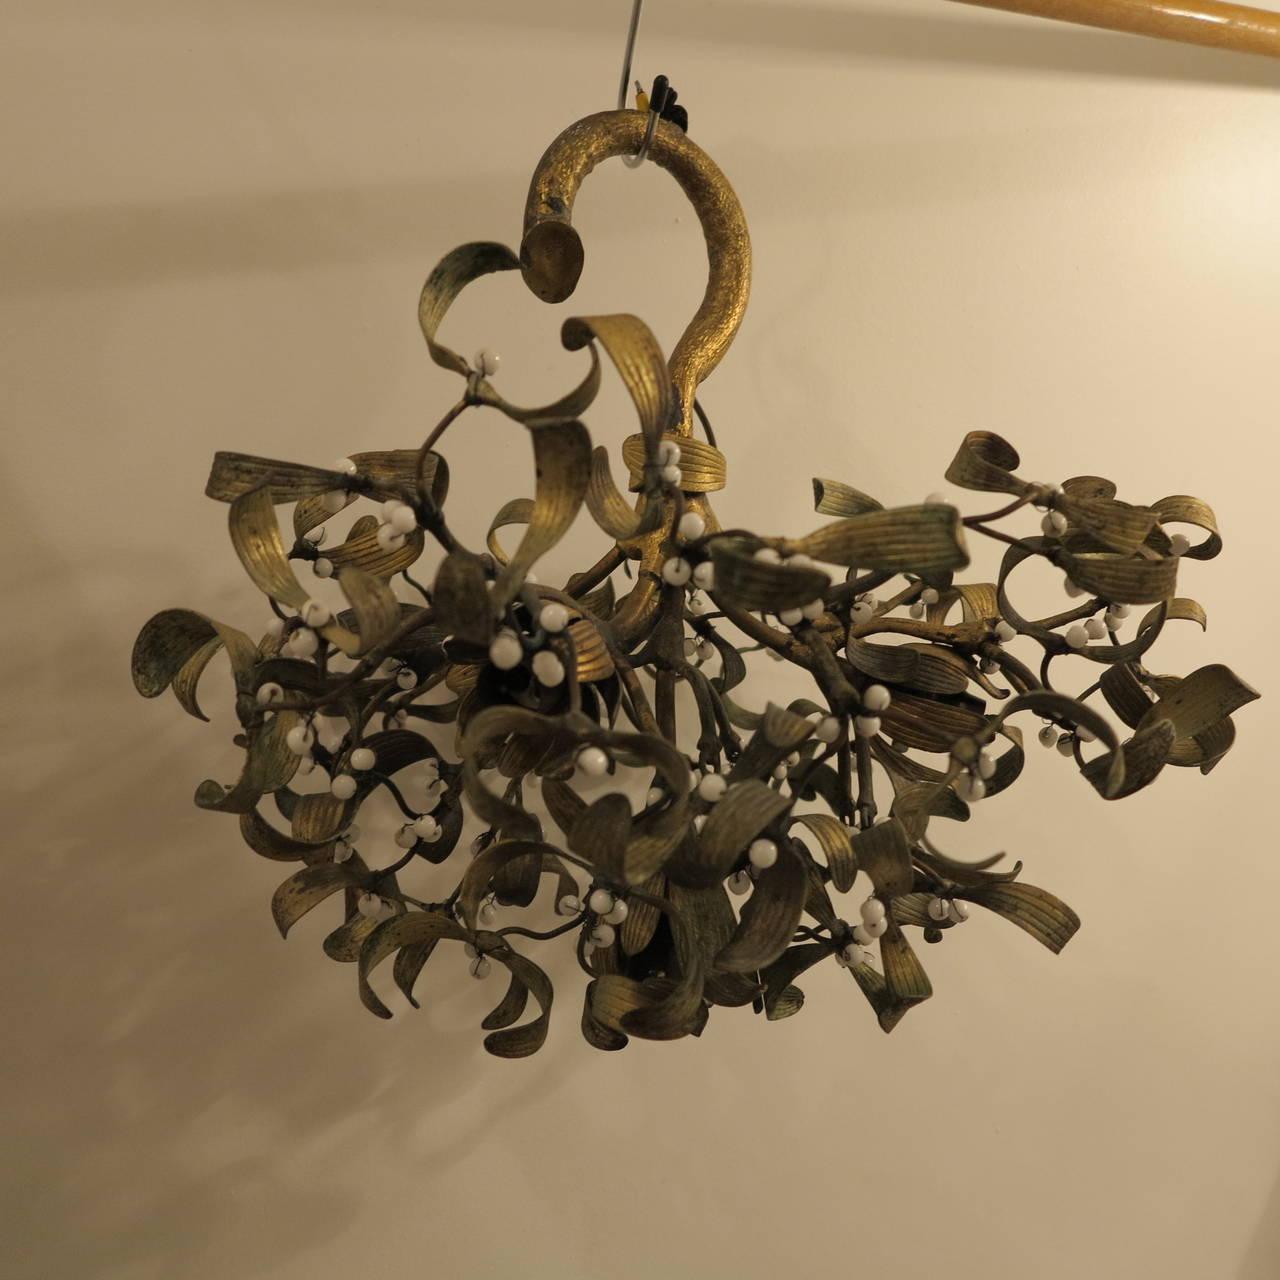 Polish Ball of Mistletoe Art Nouveau Bronze with Four Bulbs and Pearls Opaline 2